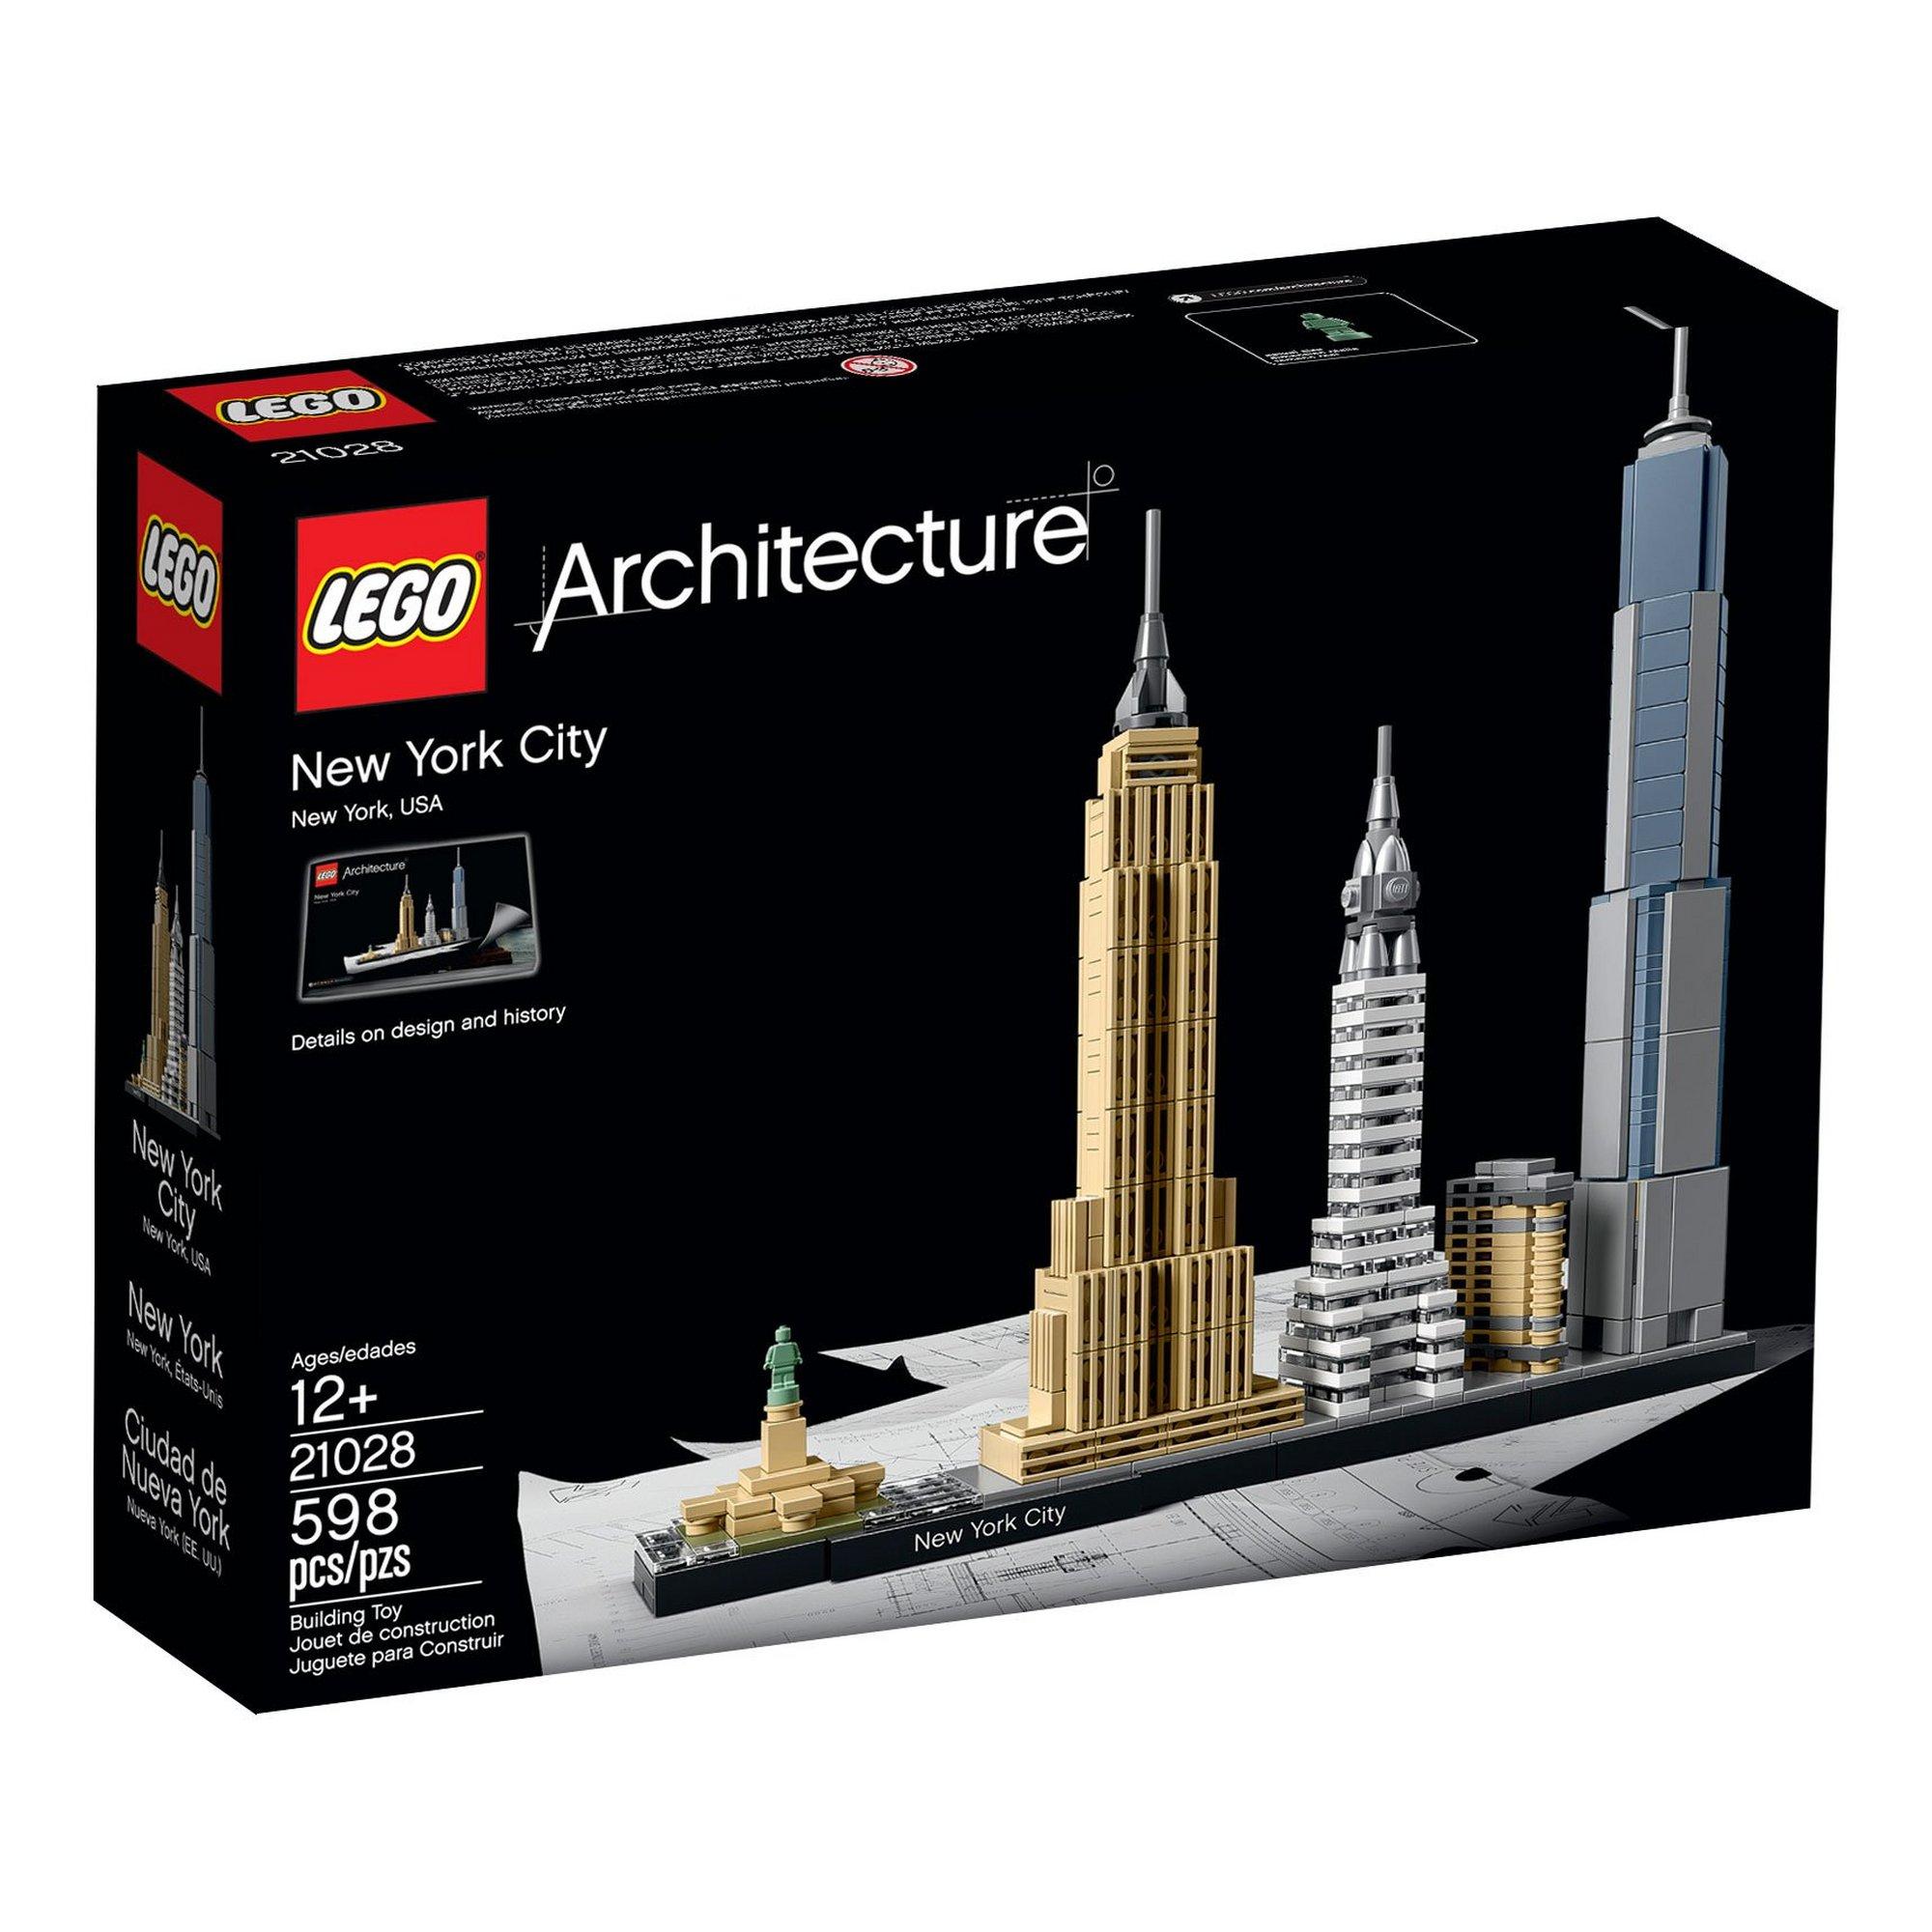 Image of LEGO Architecture New York City